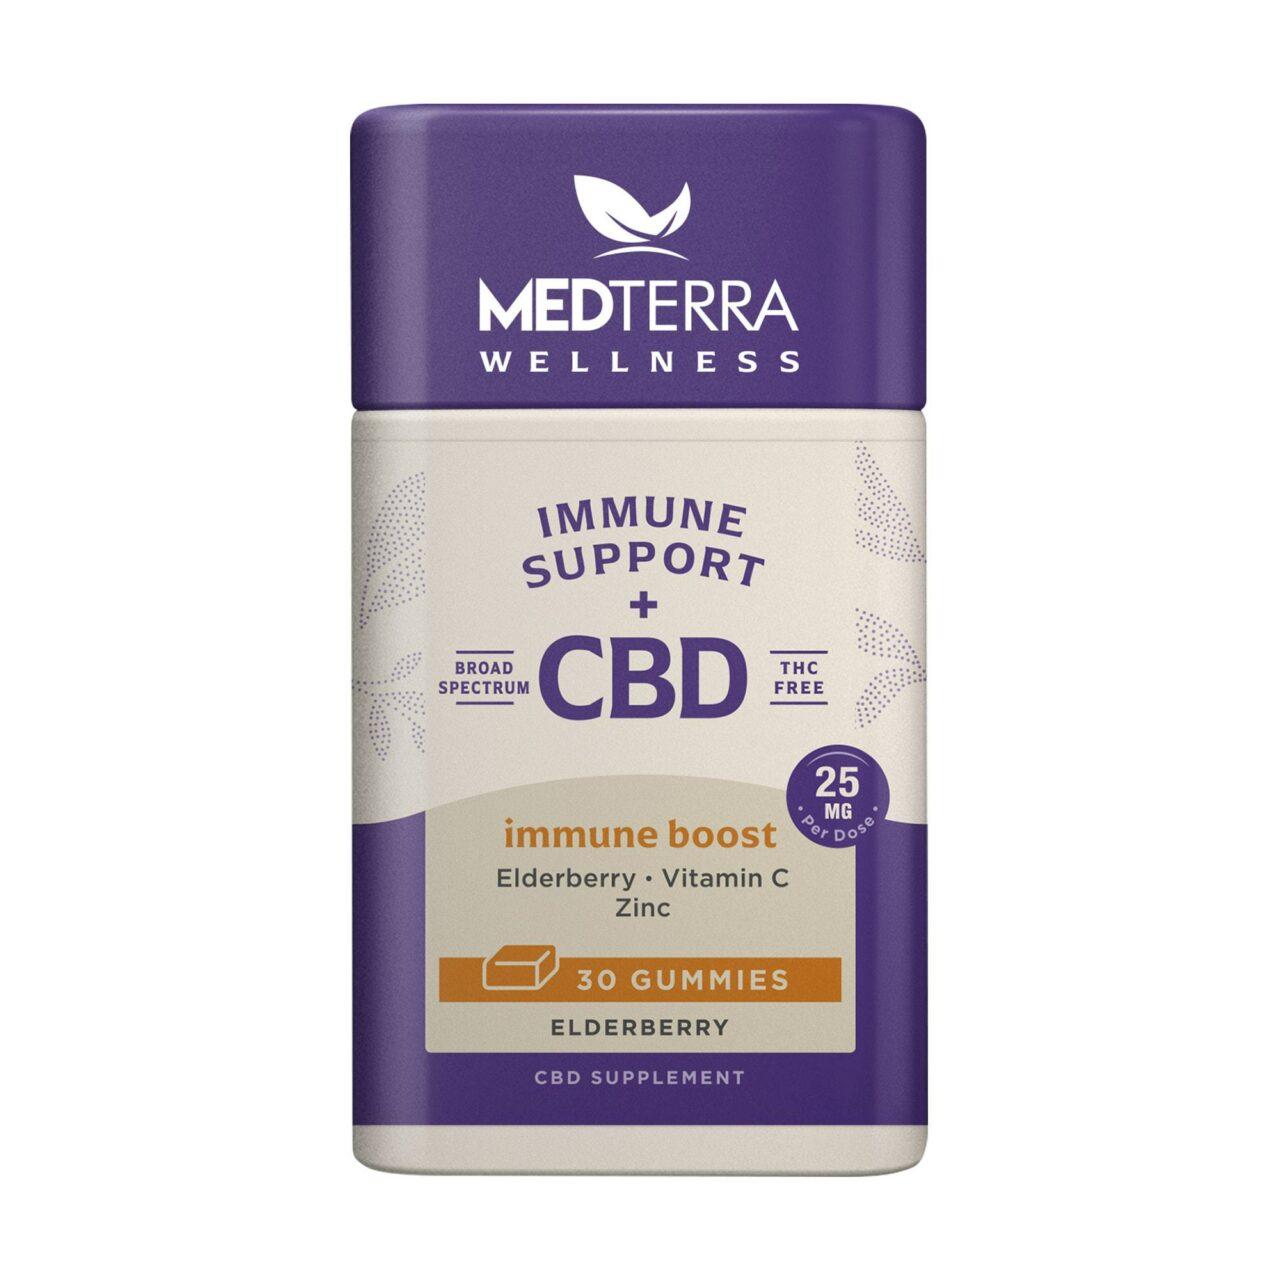 Medterra, Wellness CBD Gummies, Immune Boost, Broad Spectrum THC-Free, Elderberry, 30ct, 750mg CBD